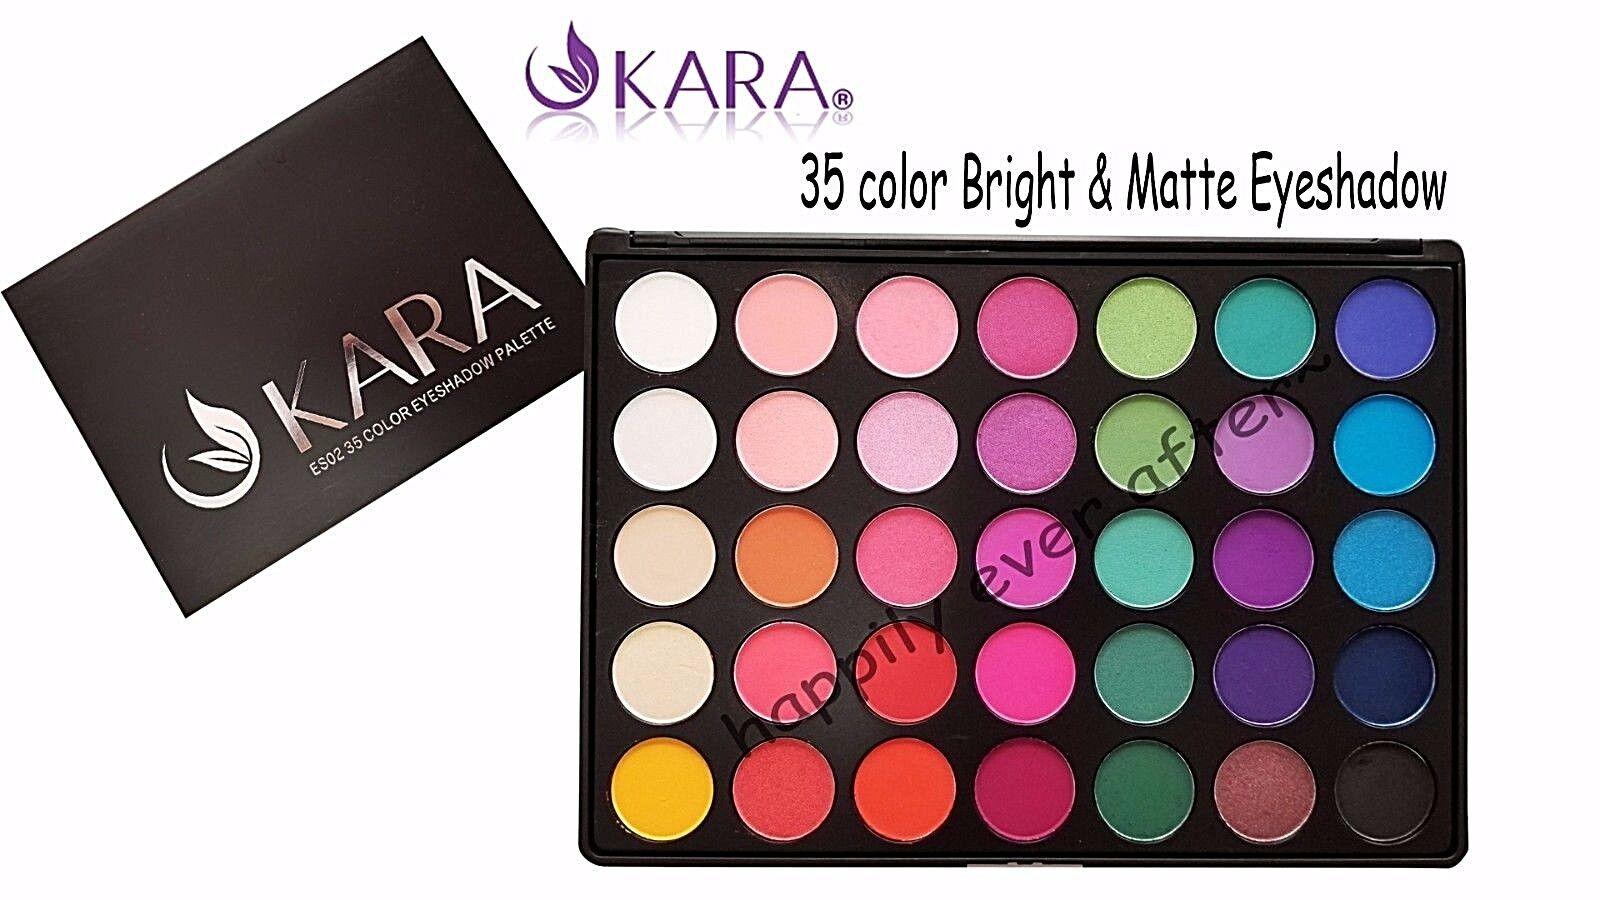 u KARA Beauty Professional Makeup Palette ES02-35 color Brig